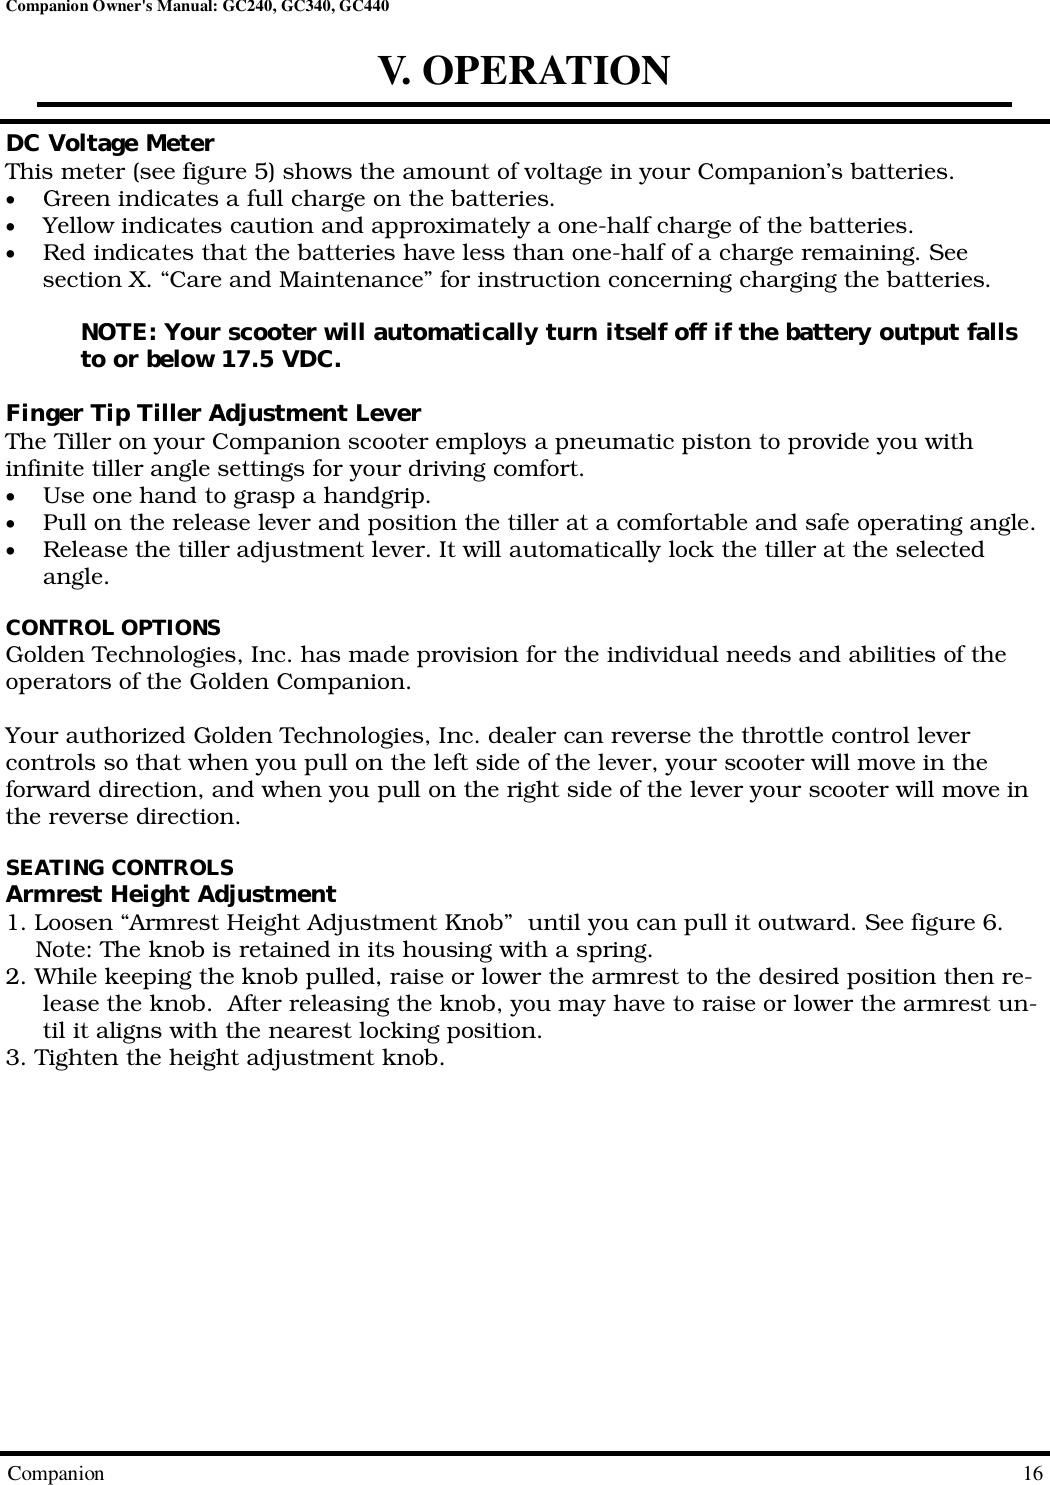 Gc440 Scooter Manual